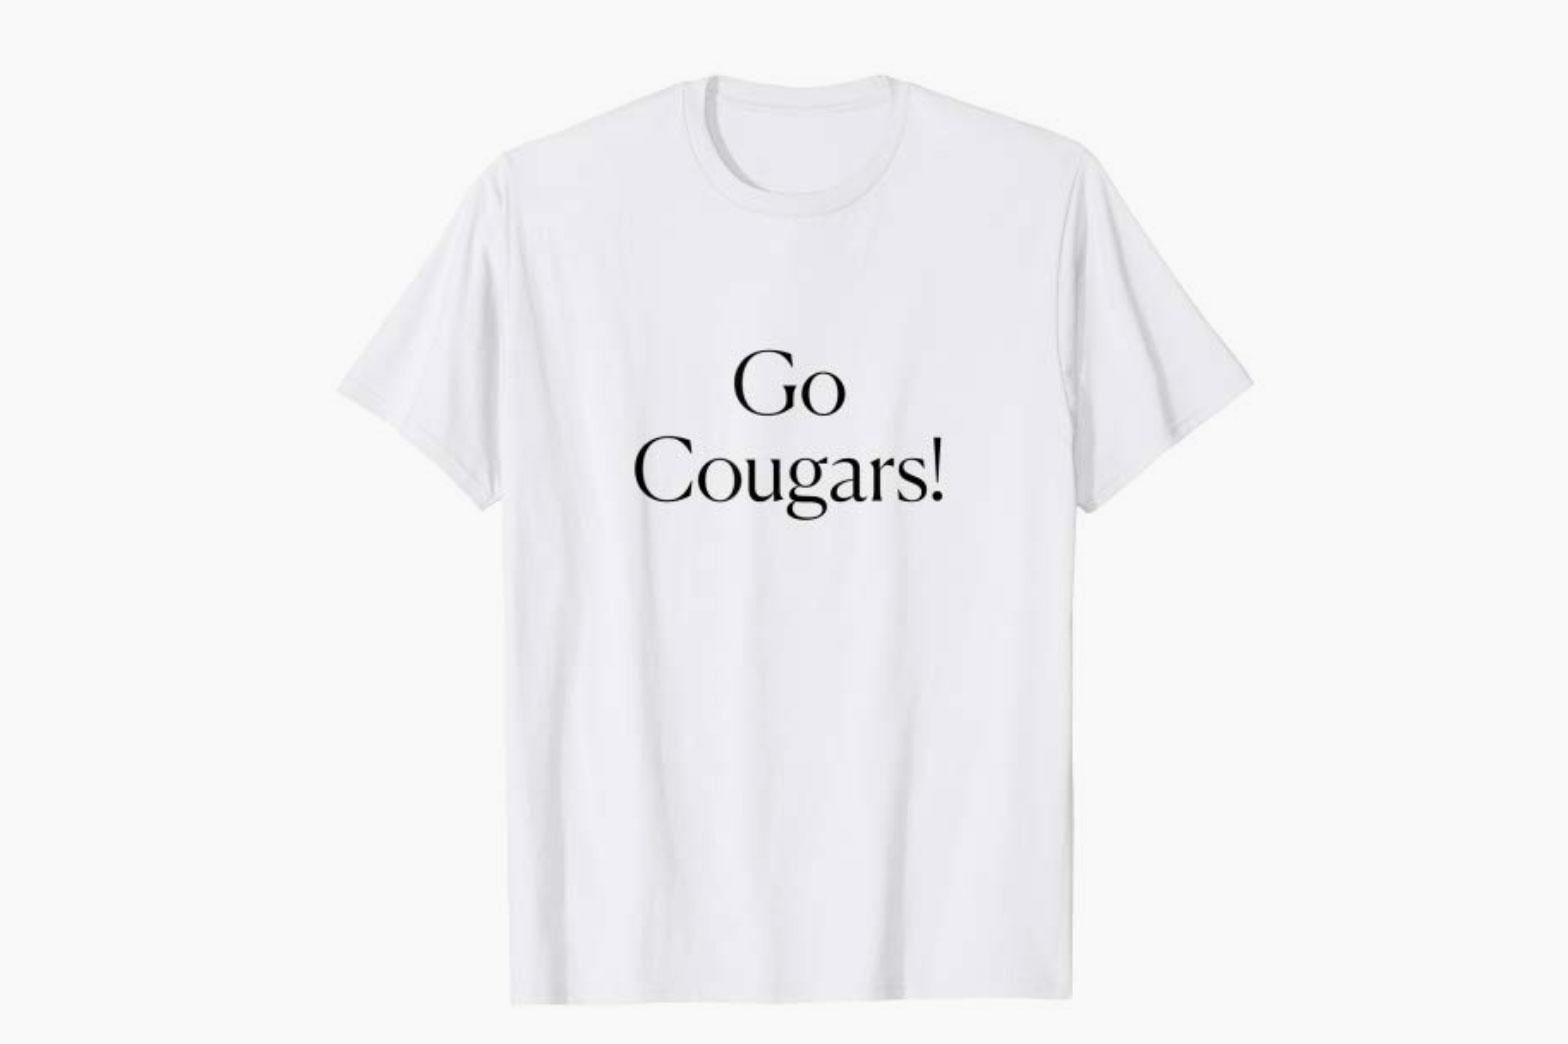 Cougar Tee